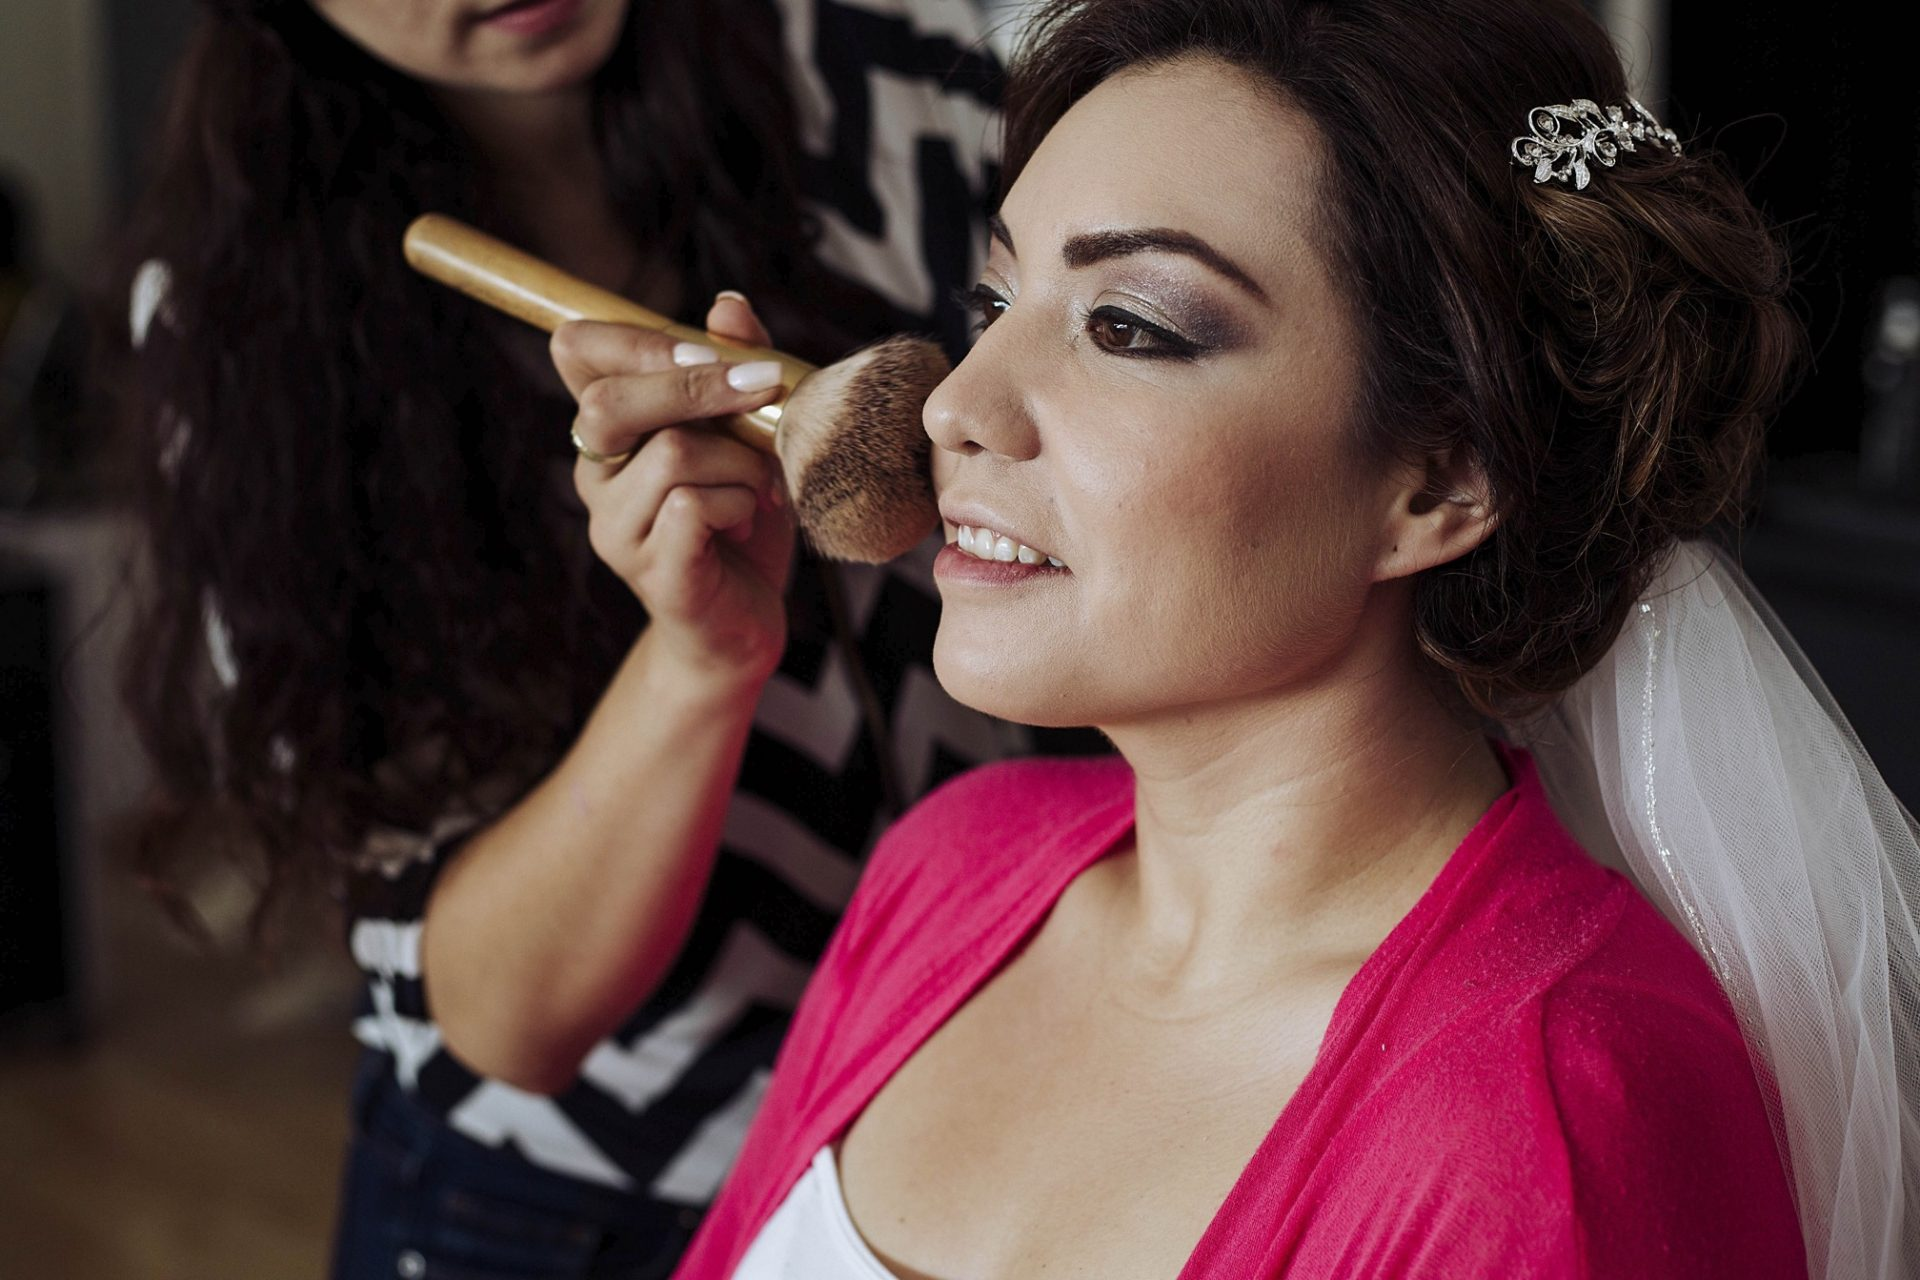 fotografo_profesional_bodas_xv_chihuahua_zacatecas_mexico-5